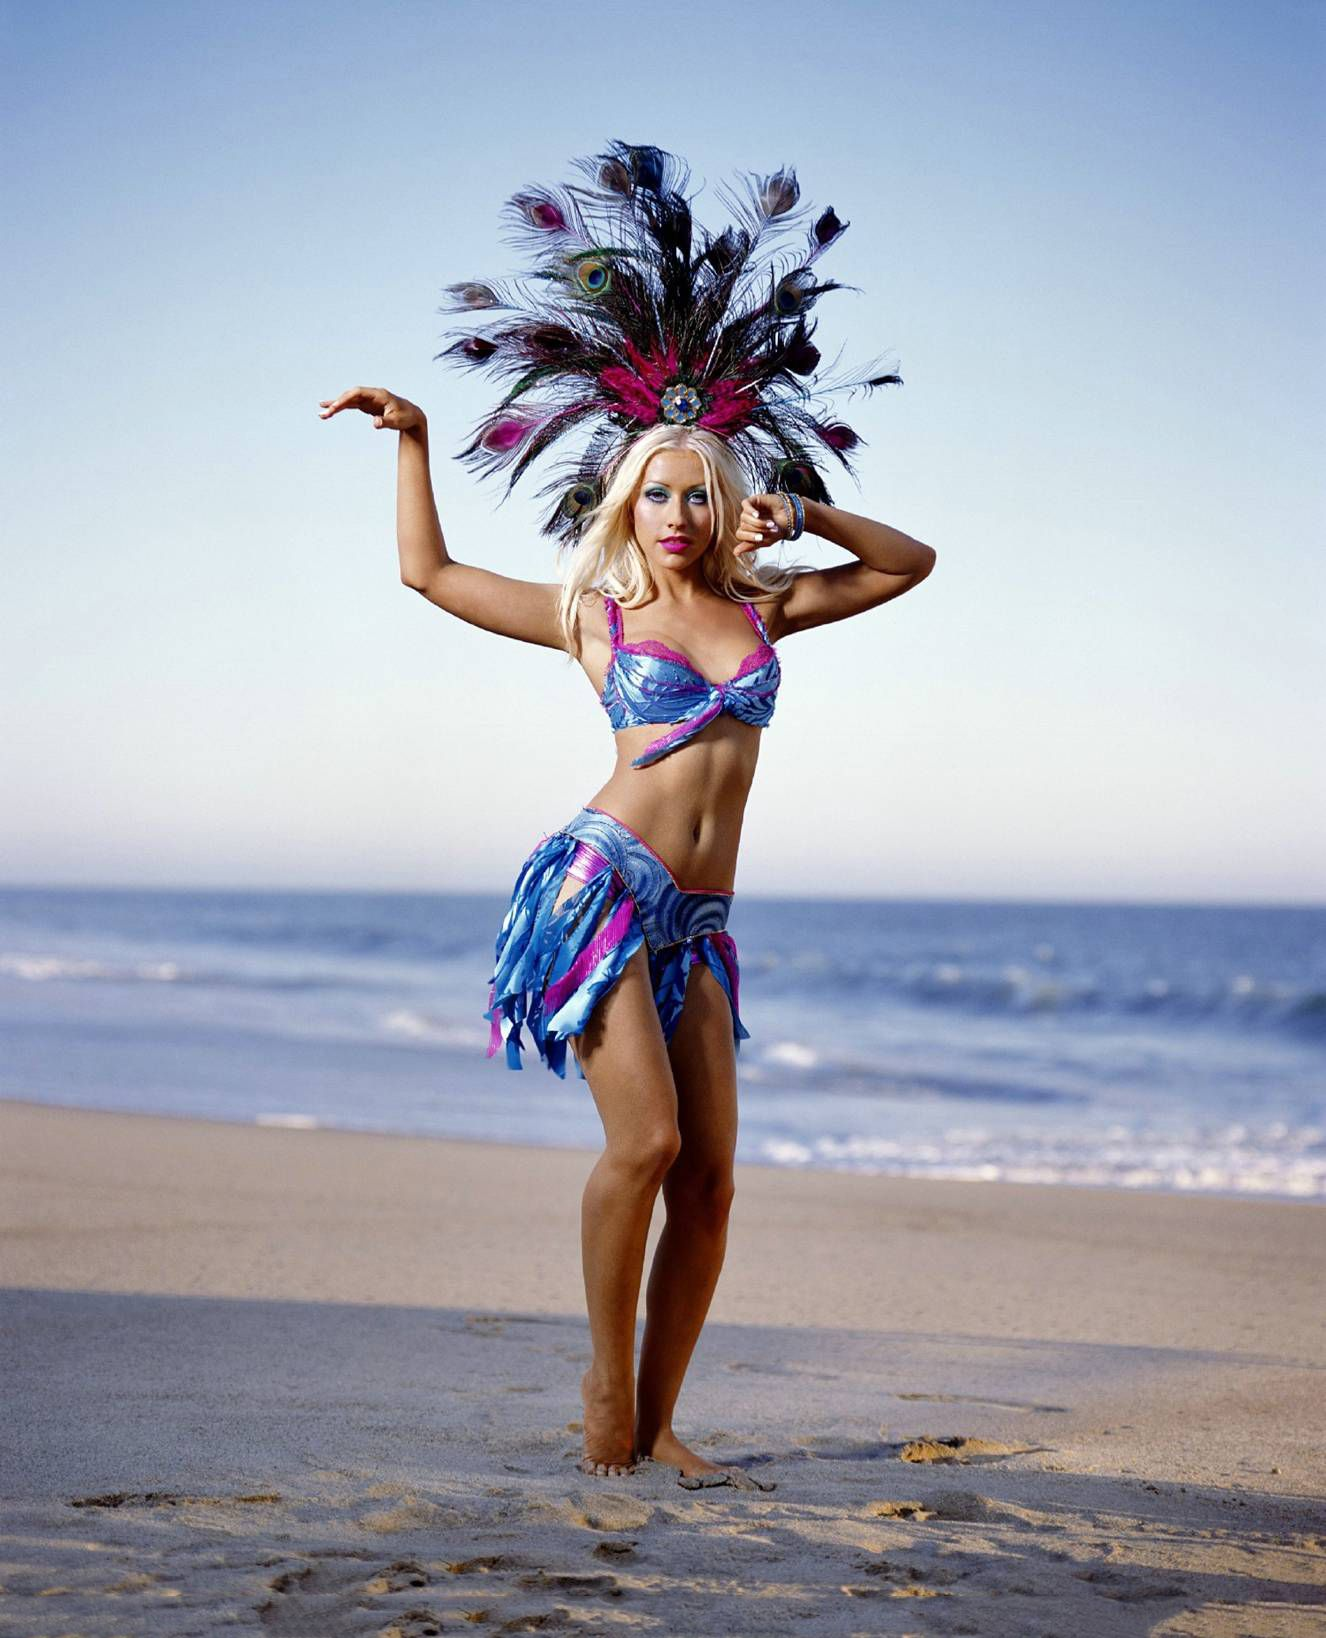 Christina Aguilera #ChristinaAguilera #FamousBeauty